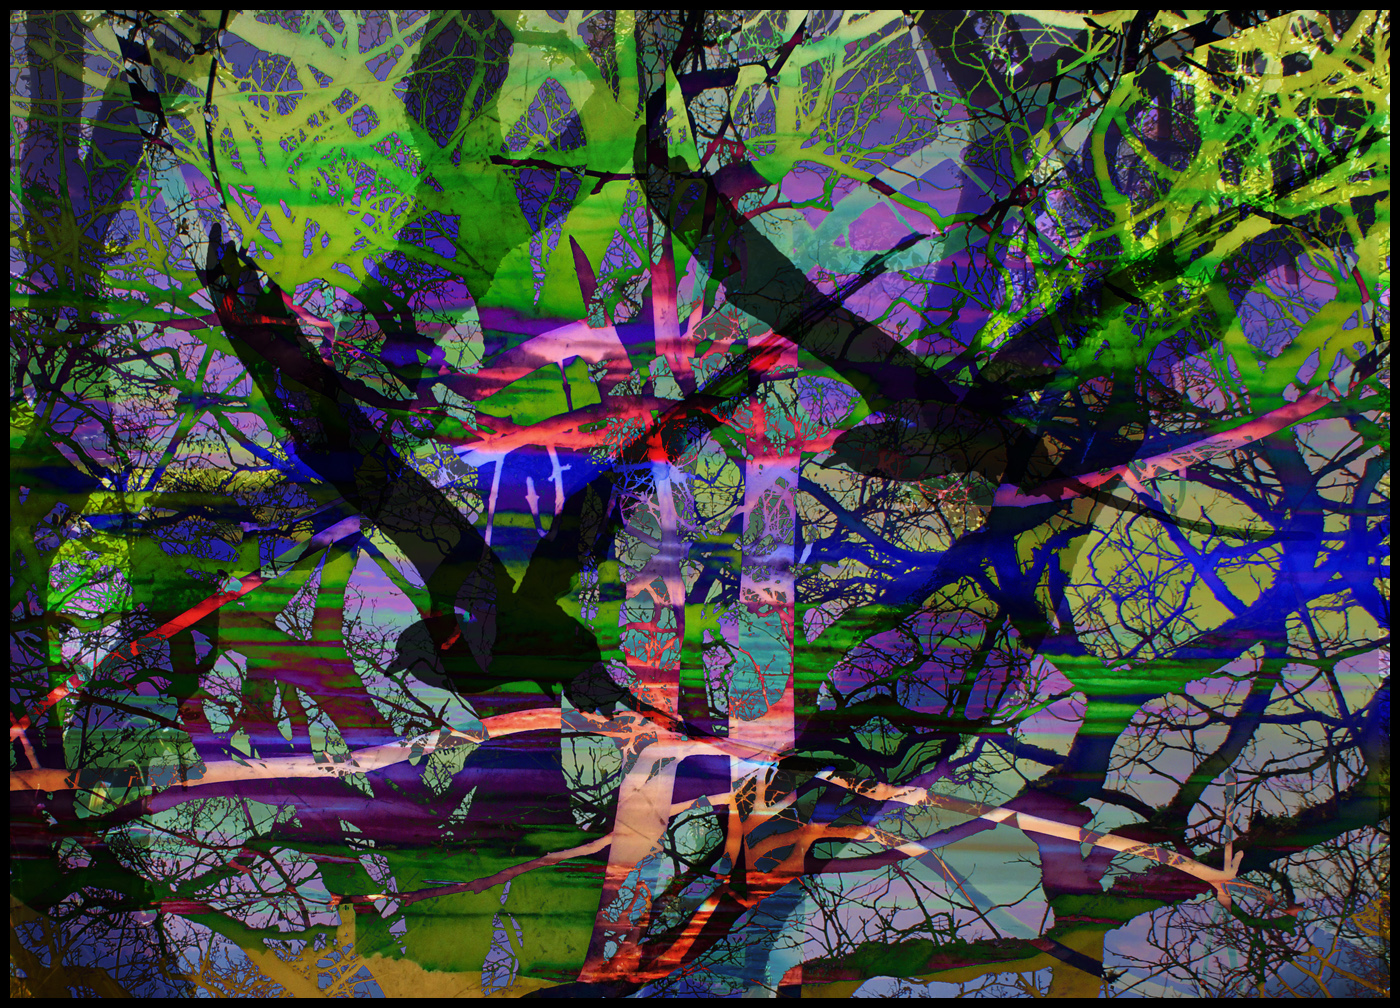 roberta houston - Trees